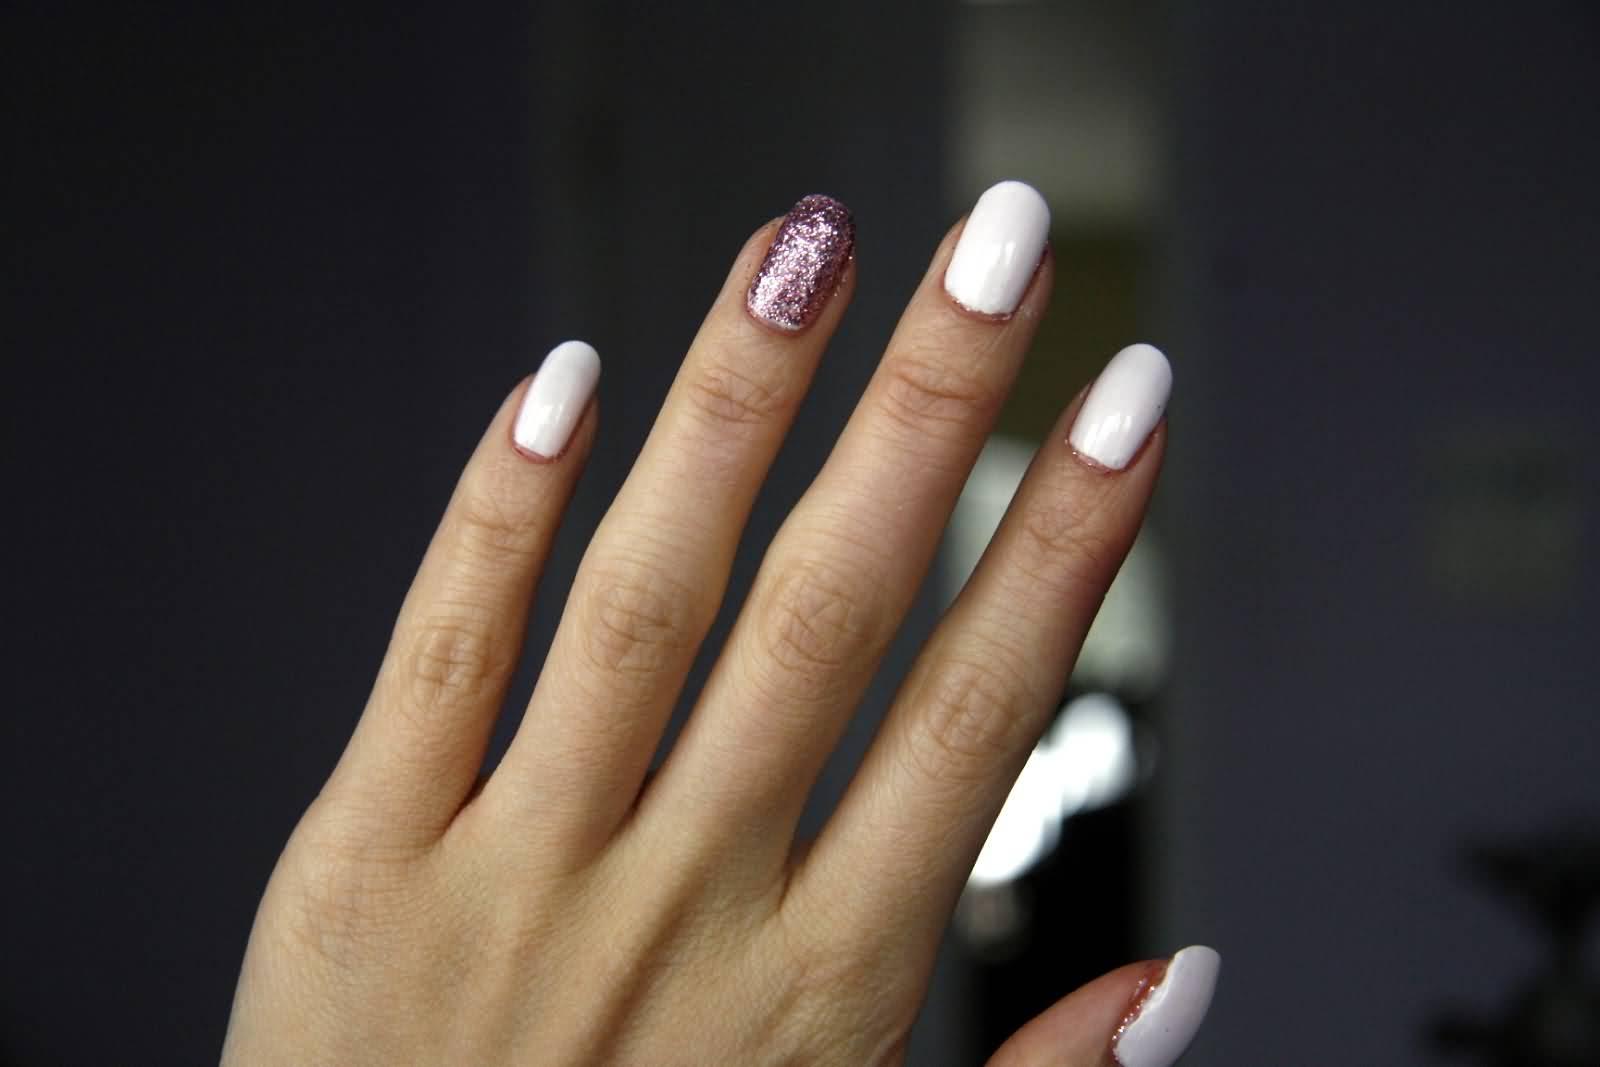 Eye Catching White And Dark Pink Glitter Accent Nail Art